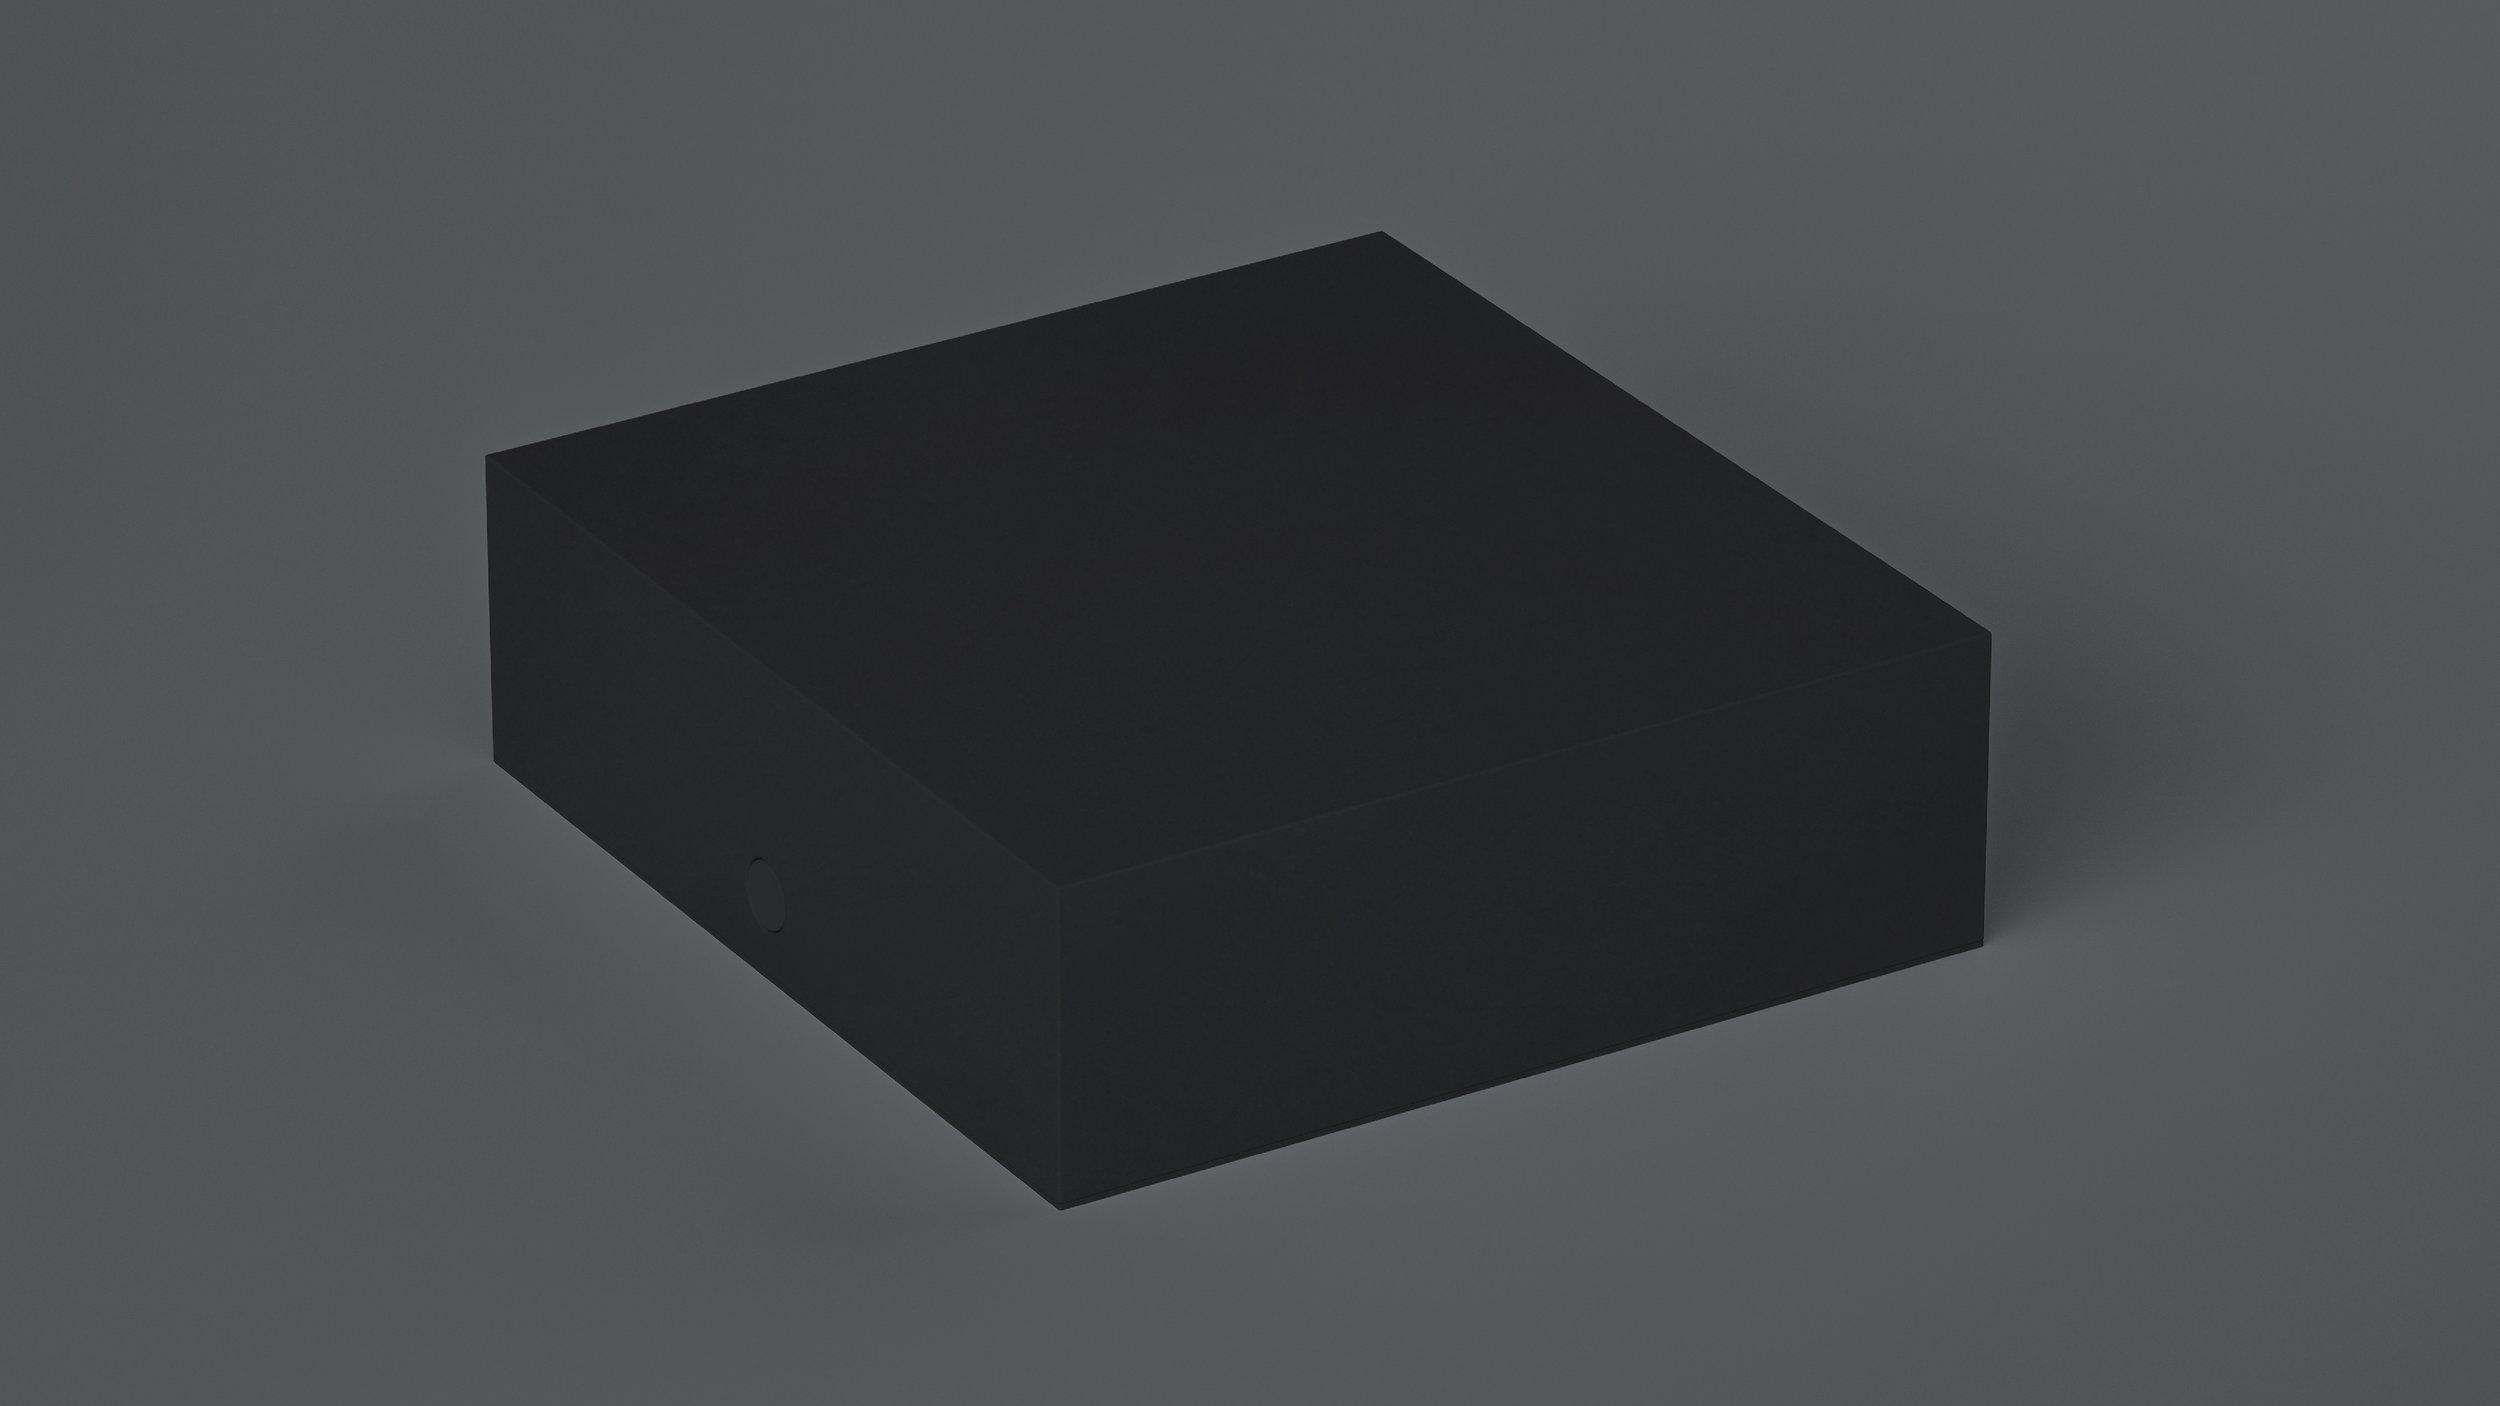 B&W_LibertySuite_PackagingStructure_R138.jpg